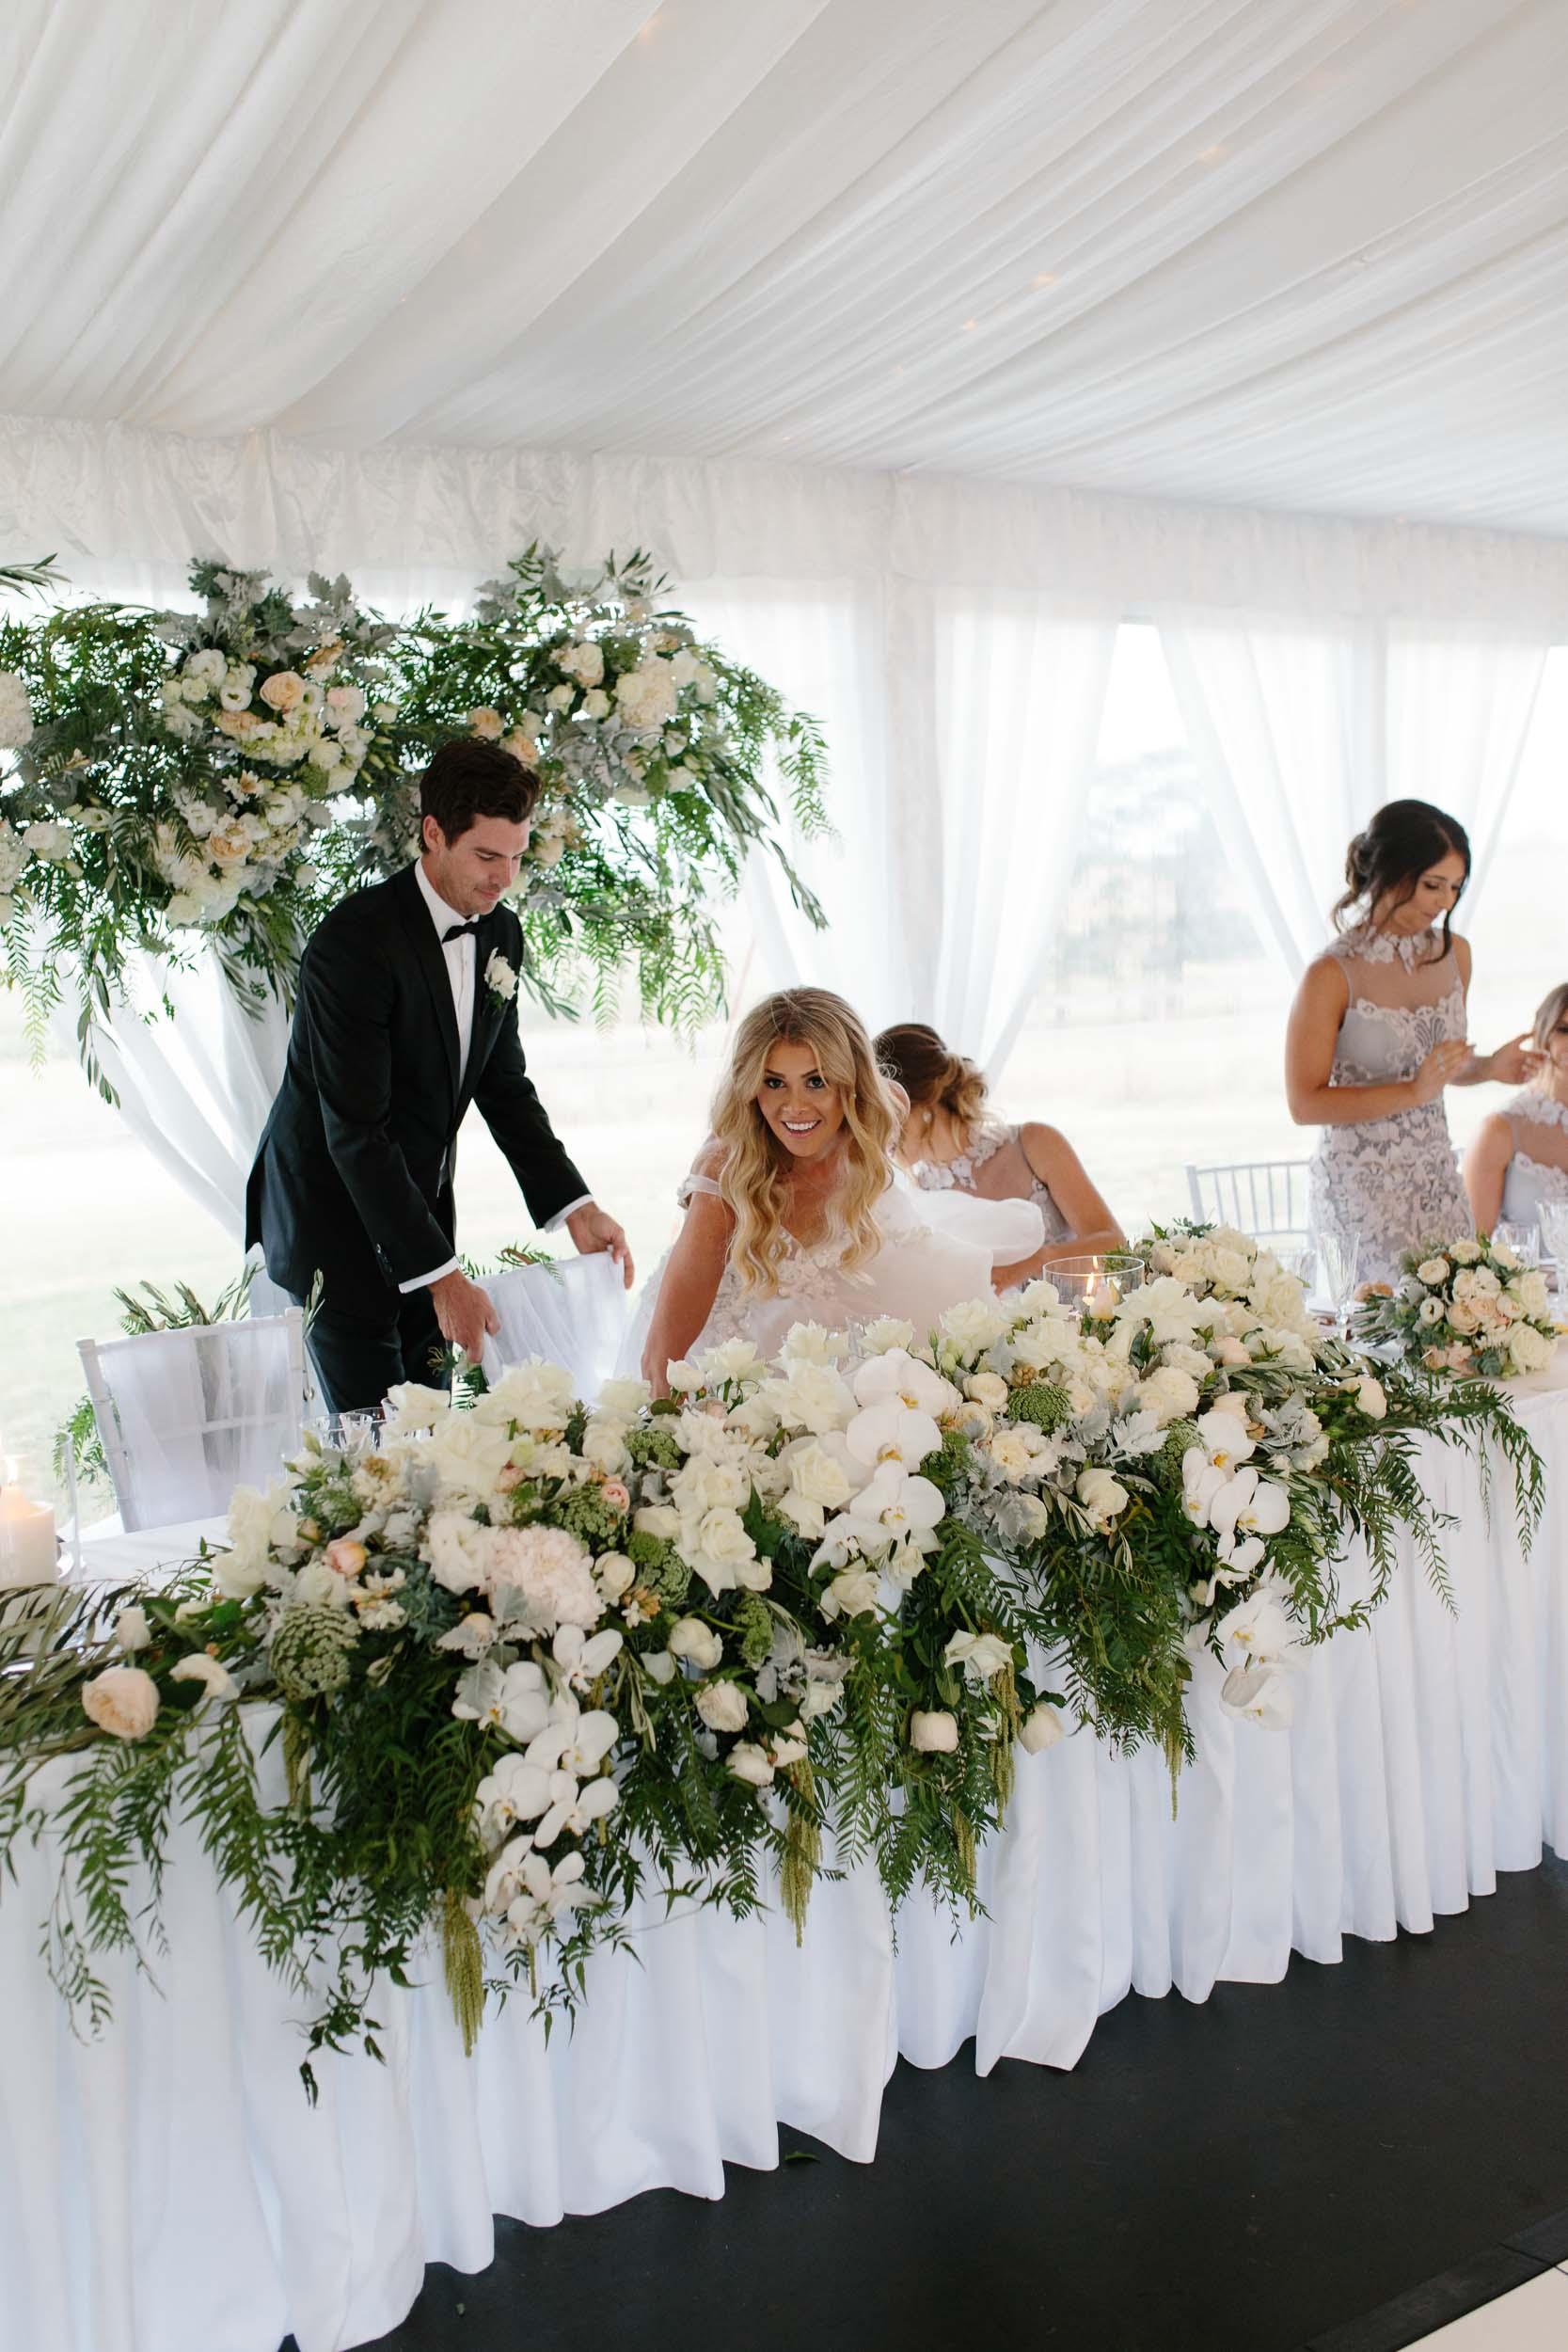 Kas-Richards-Mornington-Peninsula-Private-Property-Wedding-Marianna-Hardwick-Gown-648.jpg